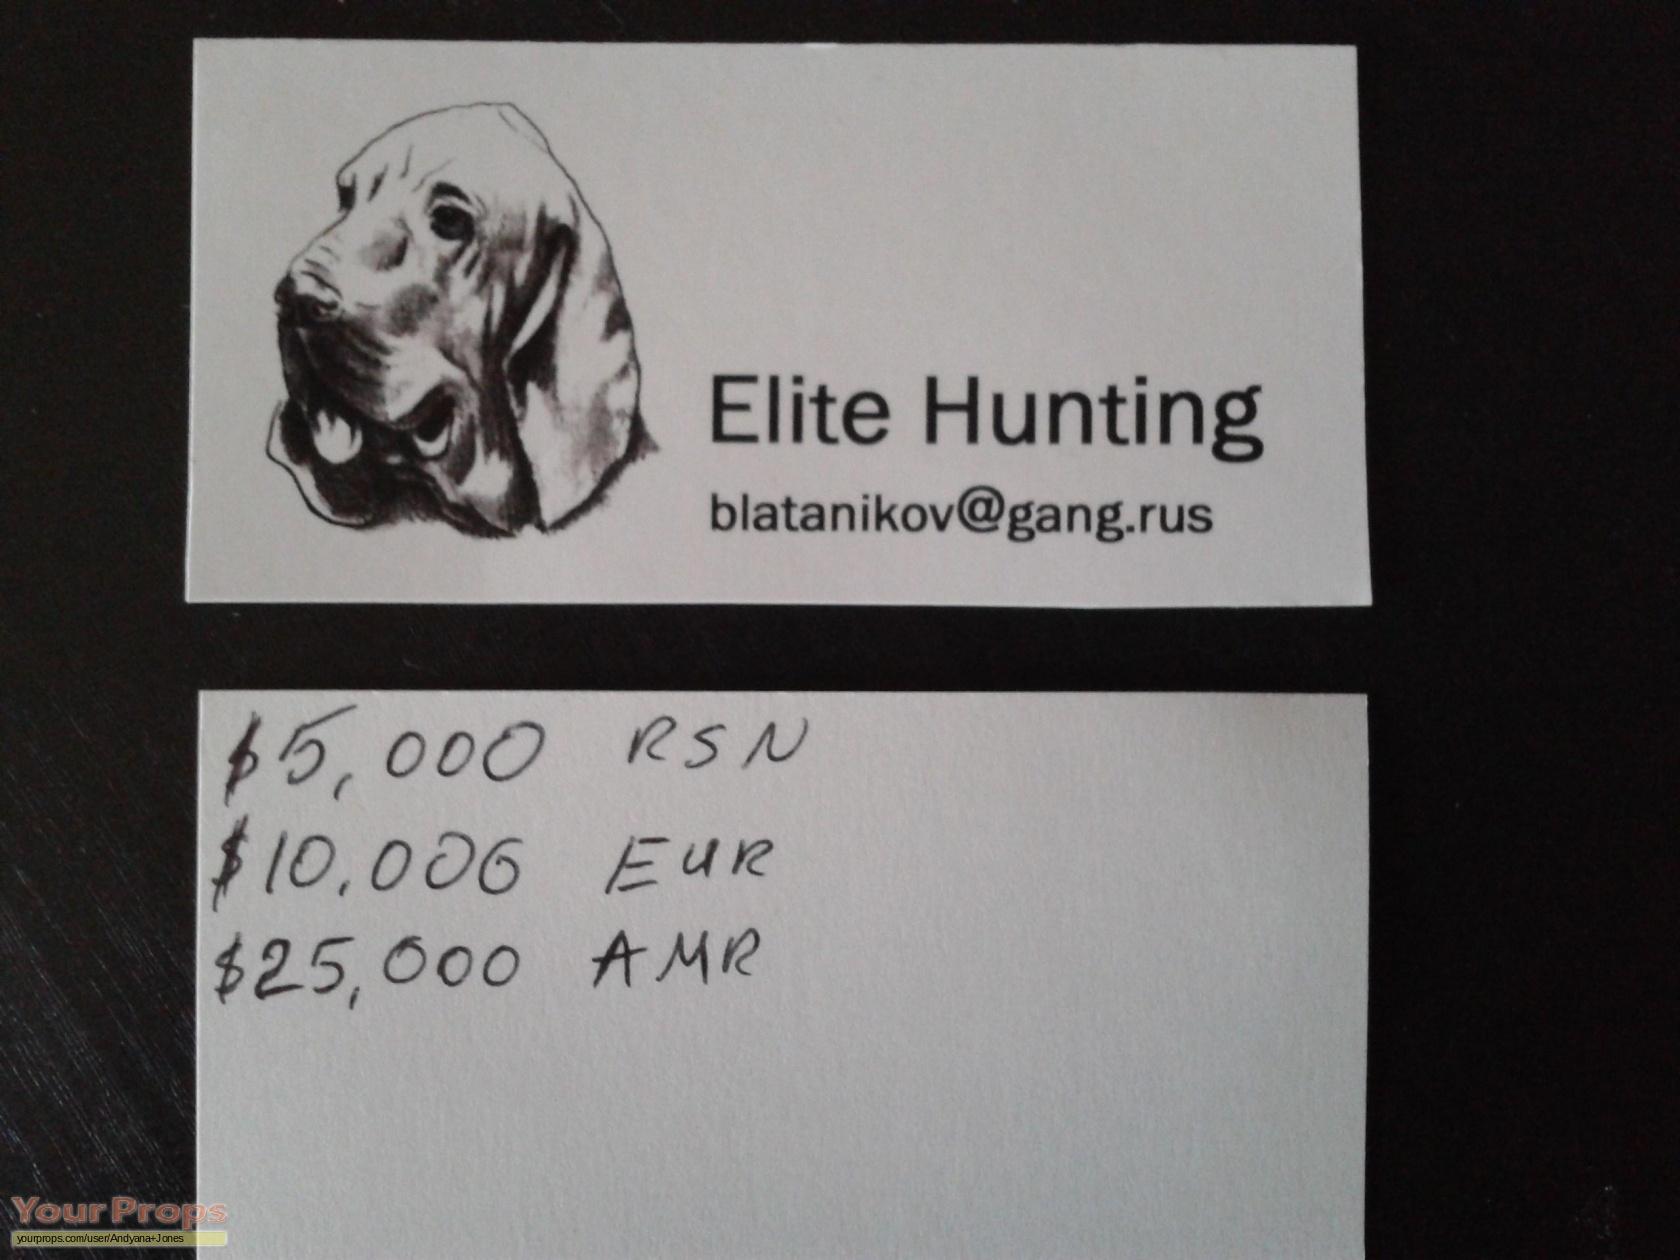 Hostel elite hunting business card replica movie prop hostel elite hunting business card colourmoves